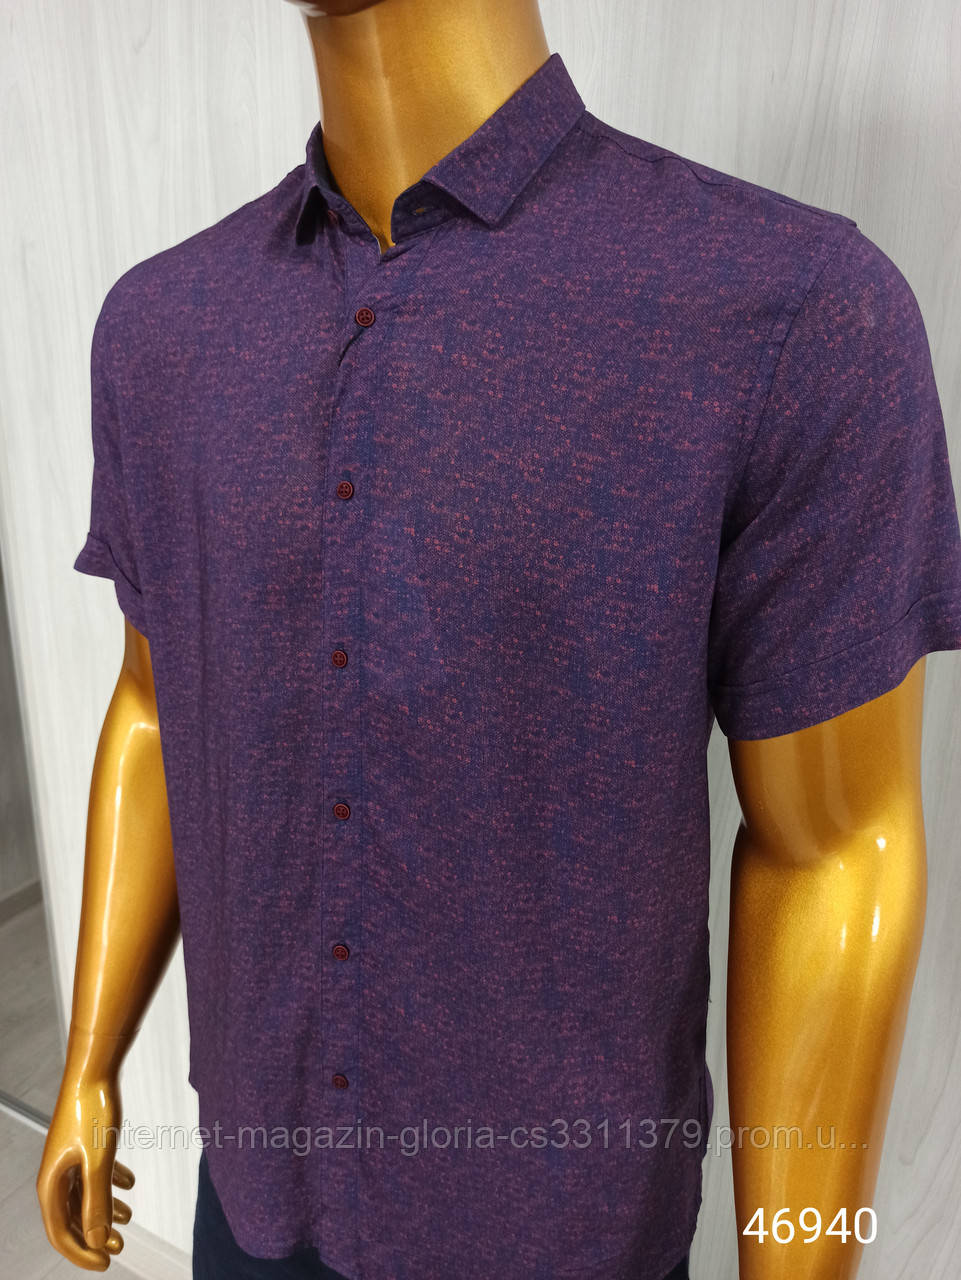 Мужская рубашка FLP. mod.46935. Батал,  Размеры: 3XL,4L,5XL,6XL.